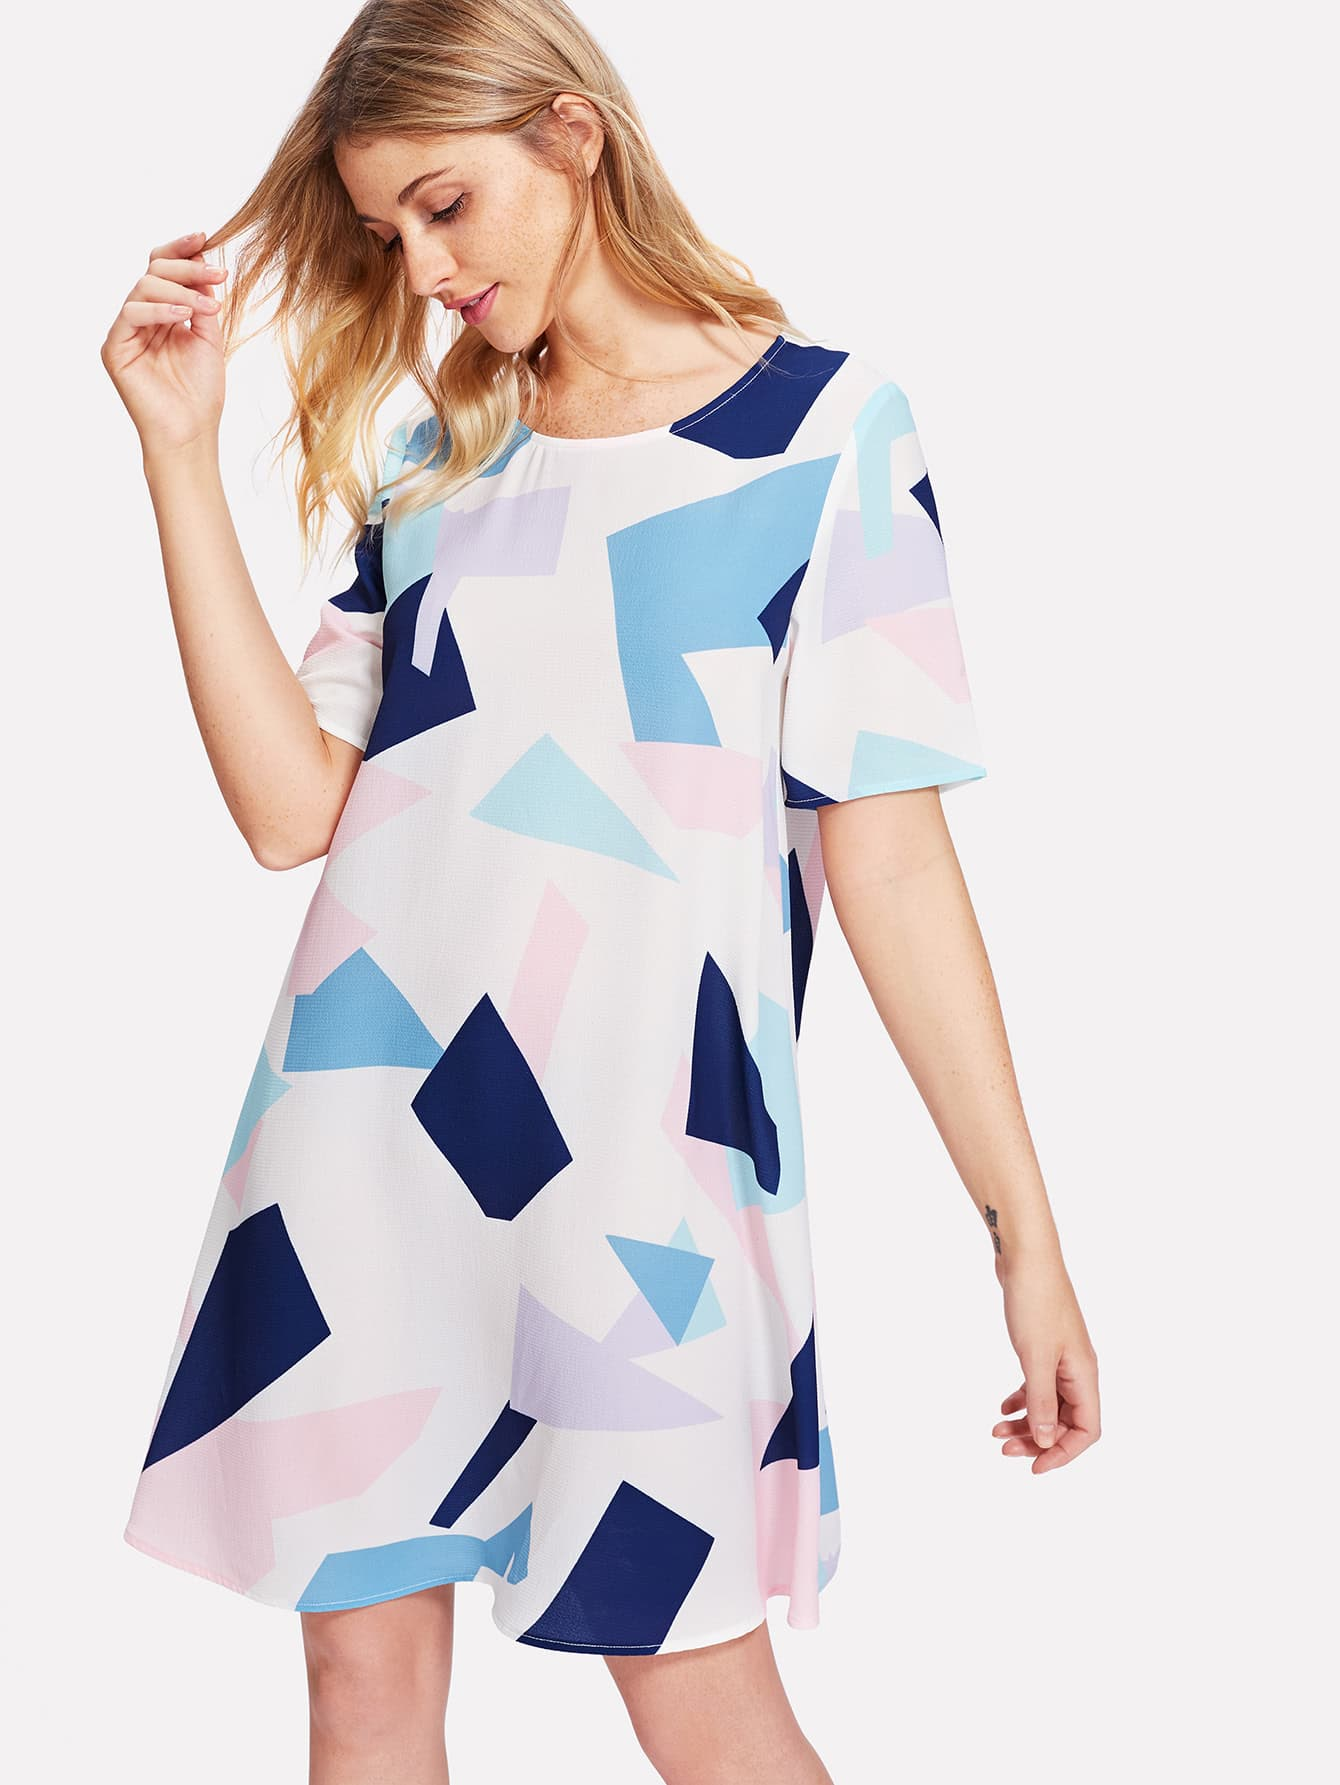 Allover Geometric Print Dress allover bear print dress